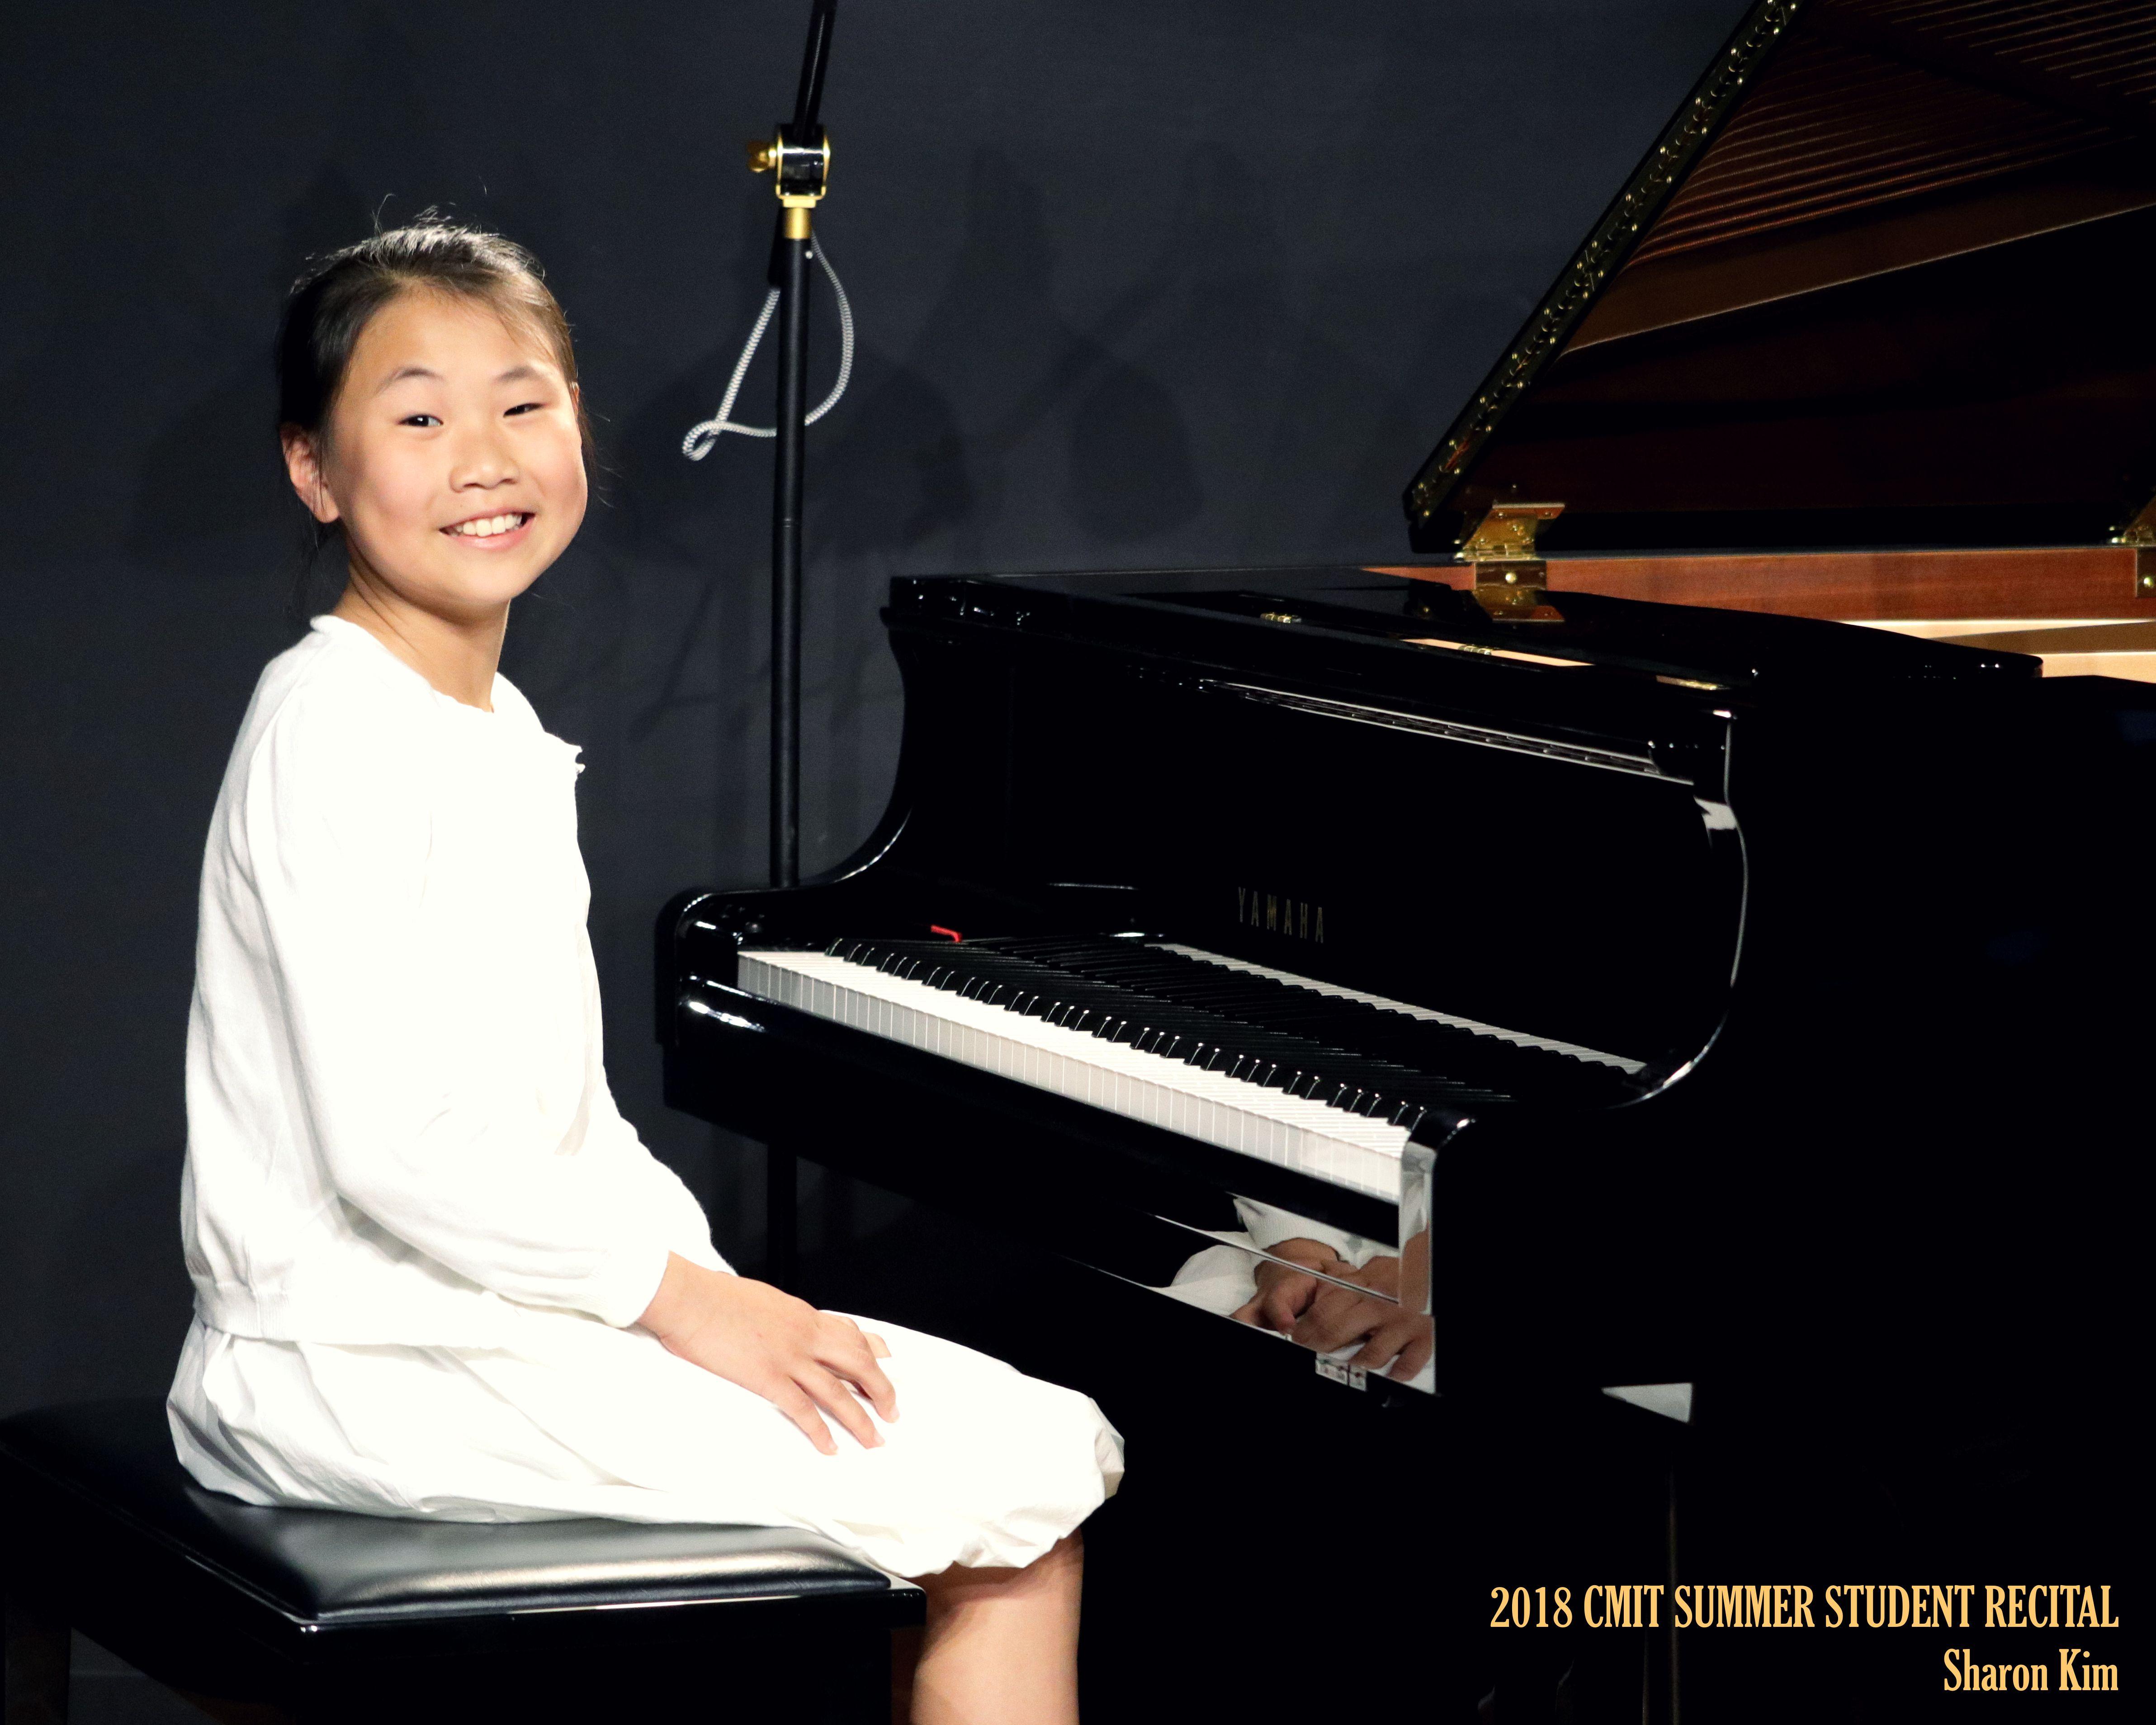 17 Sharon Kim